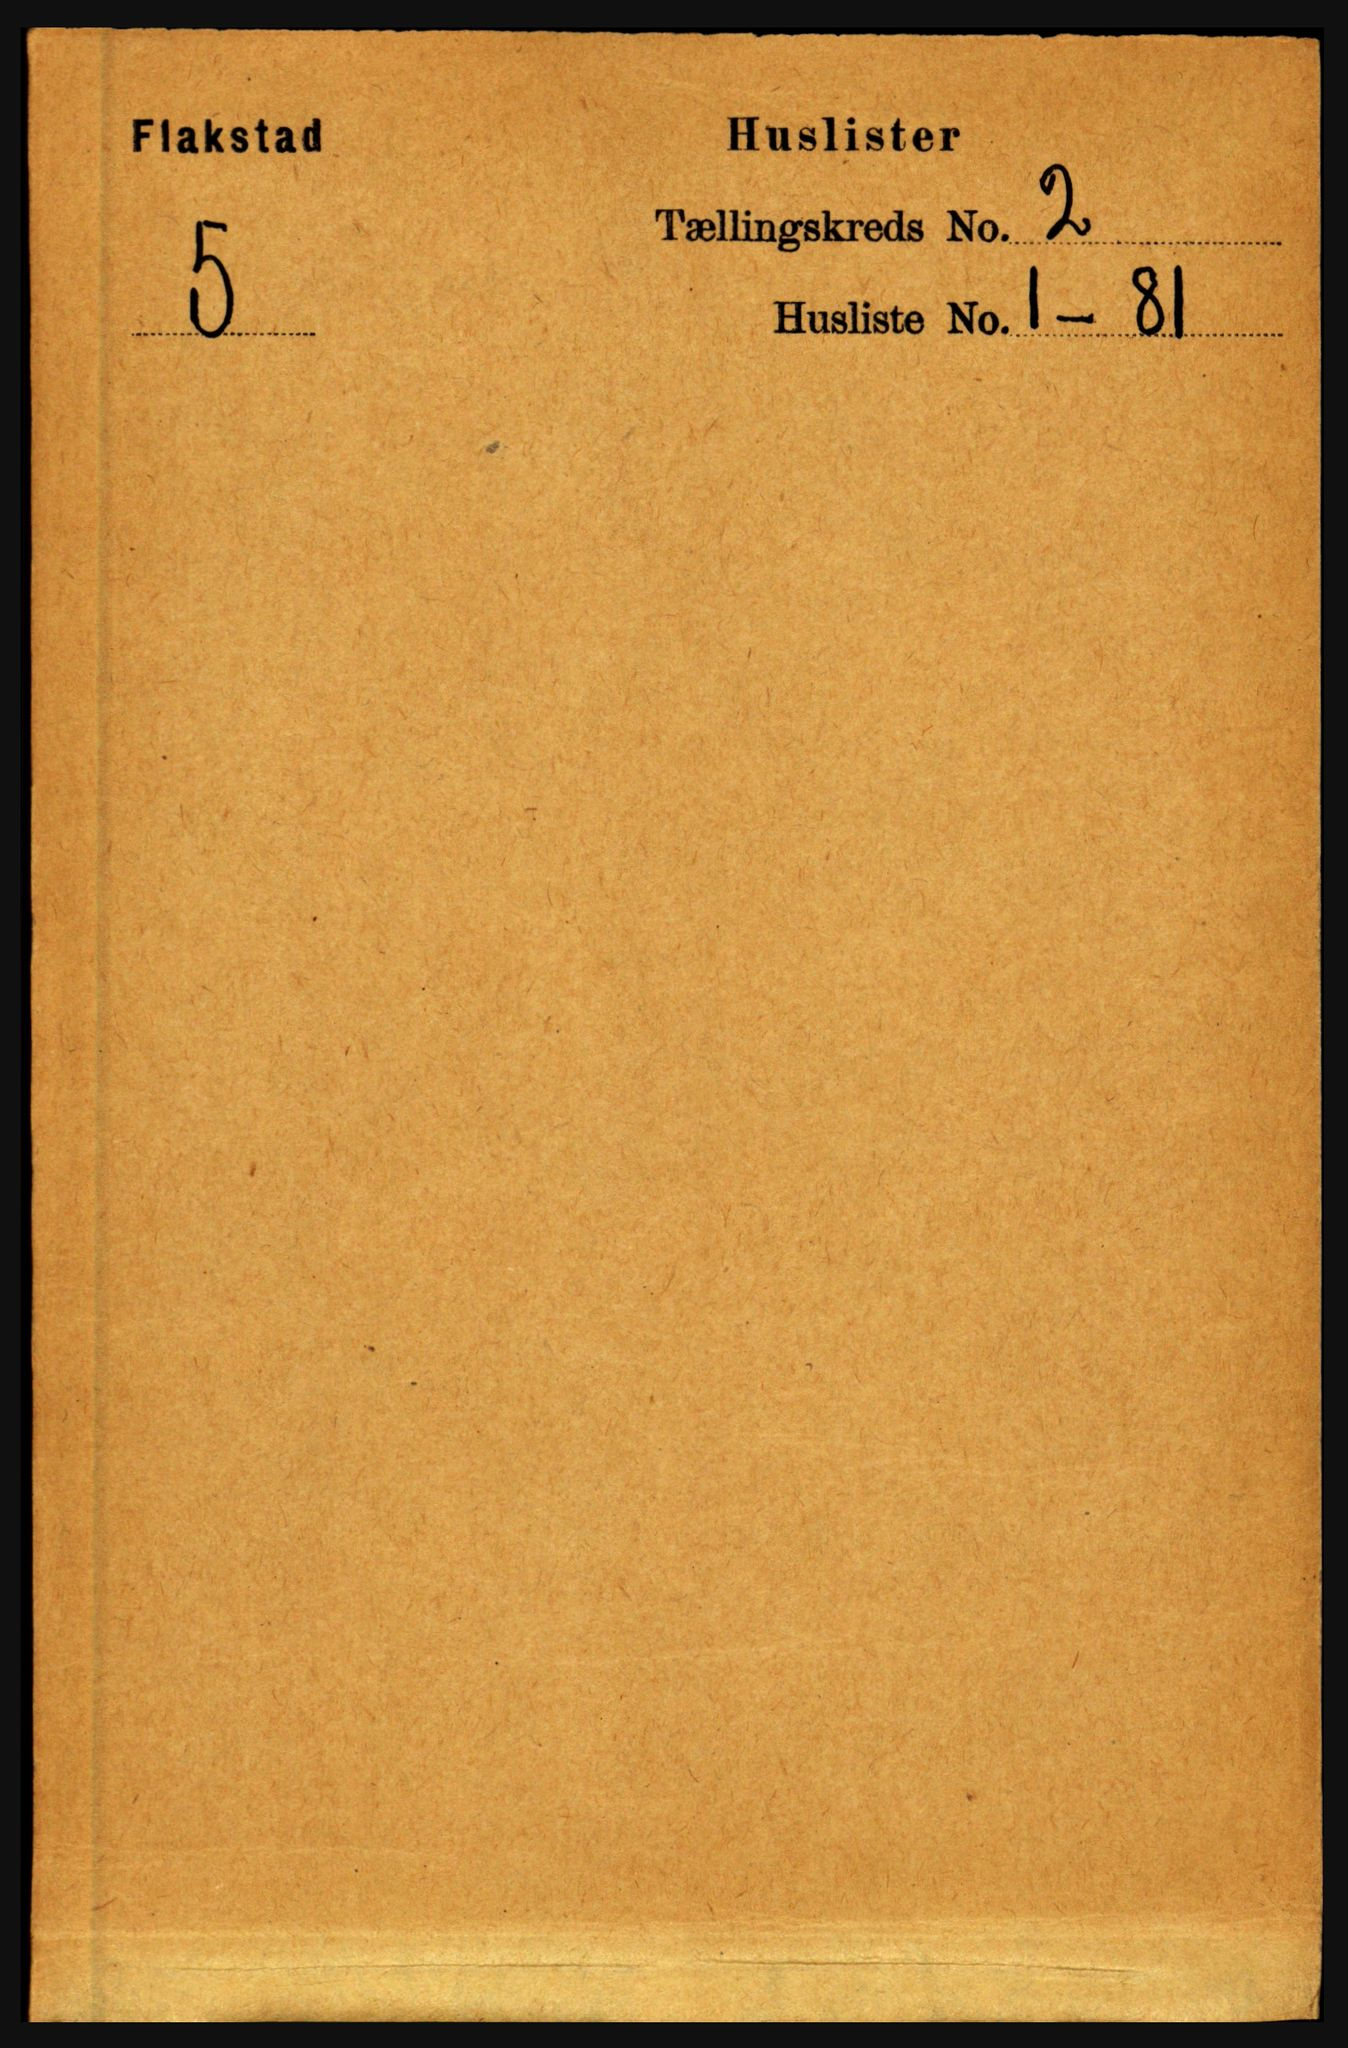 RA, Folketelling 1891 for 1859 Flakstad herred, 1891, s. 514